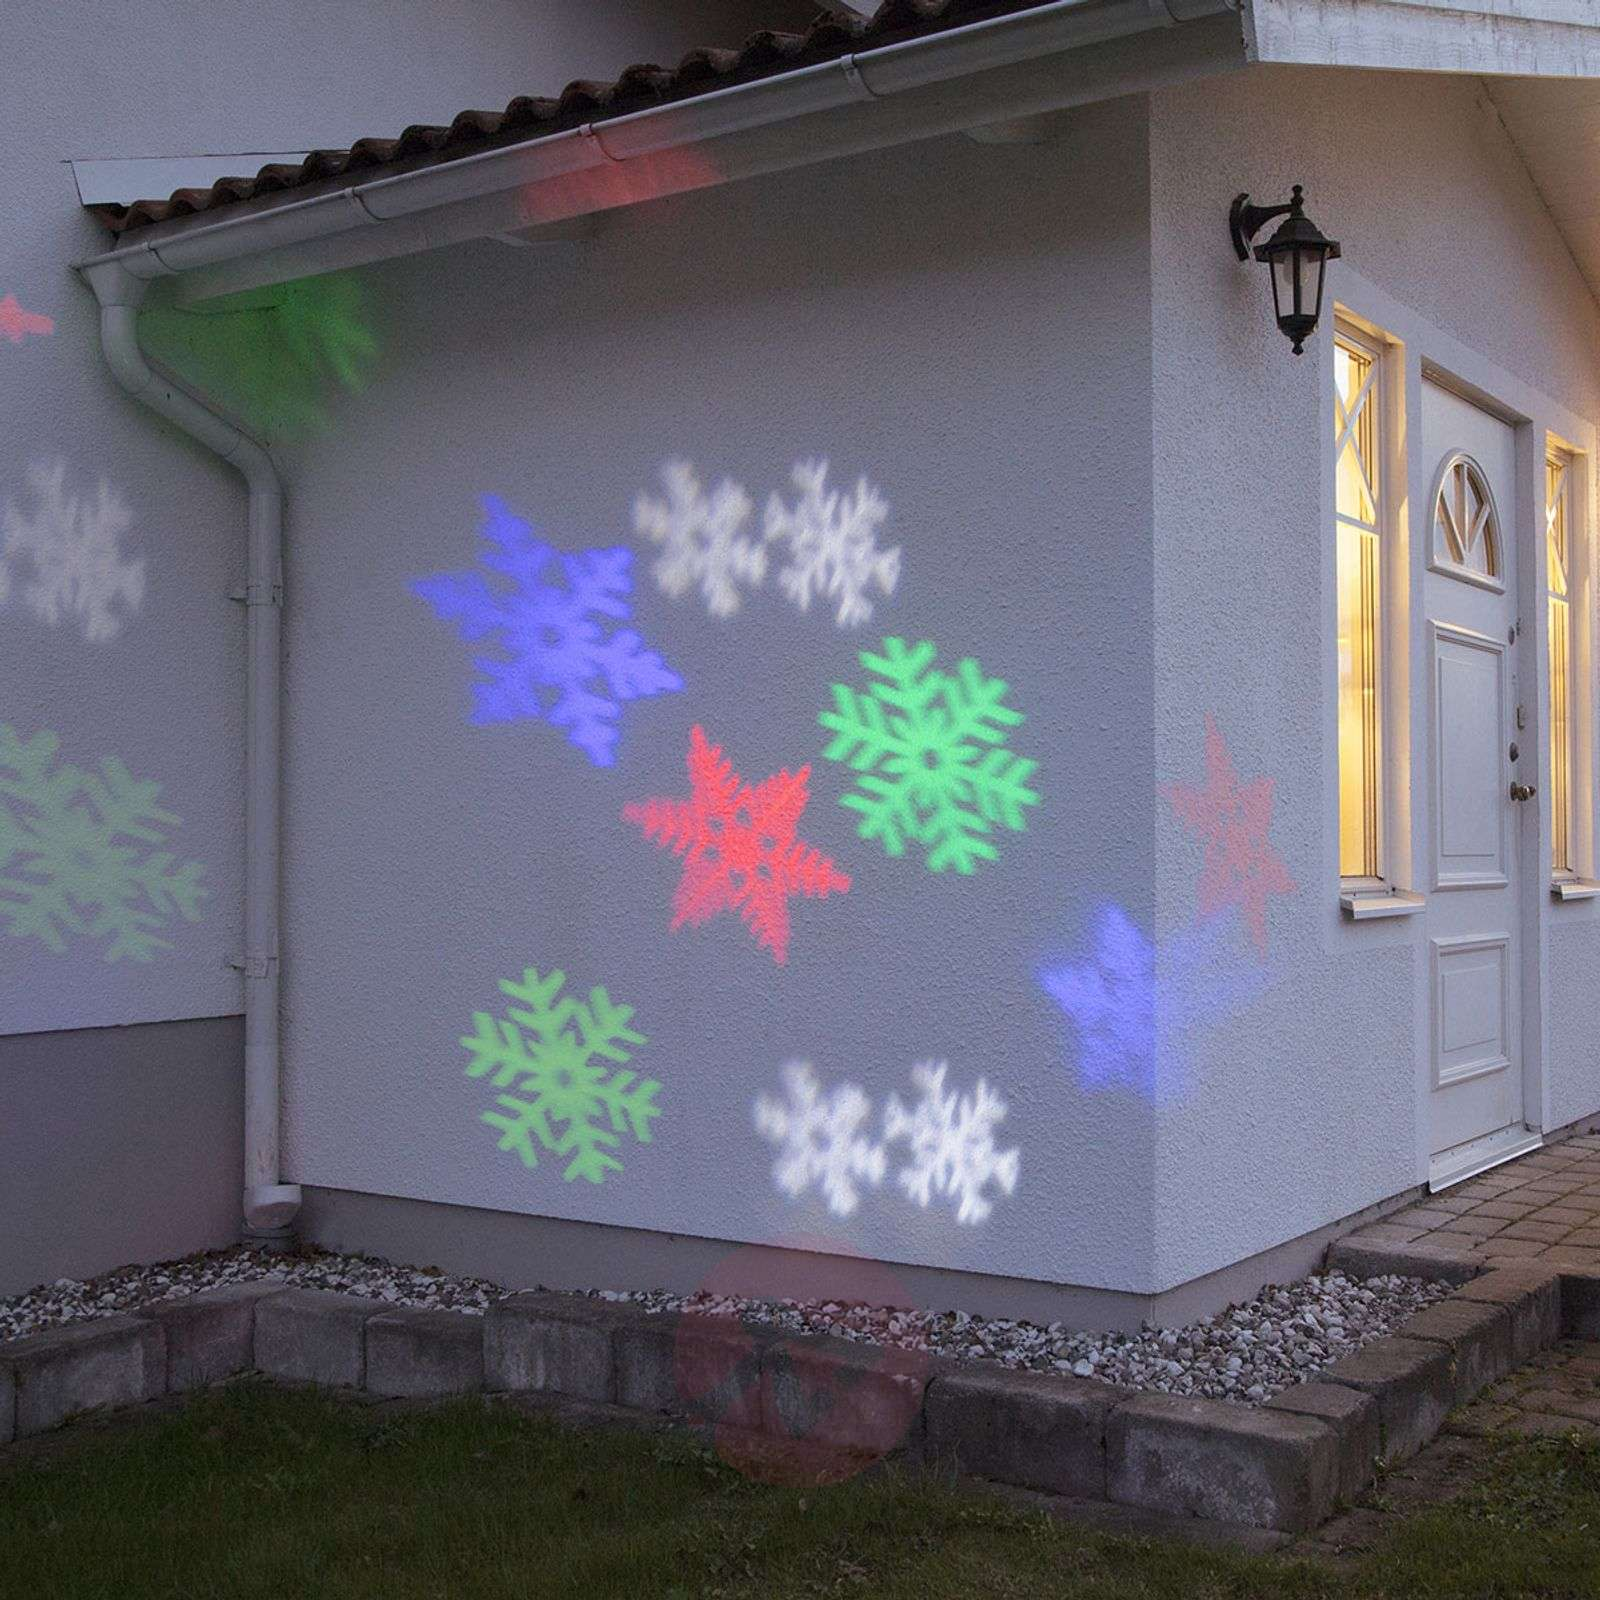 Julkisivu-koristevalaisin LED-projektori LEDLIGHT-1523456-01